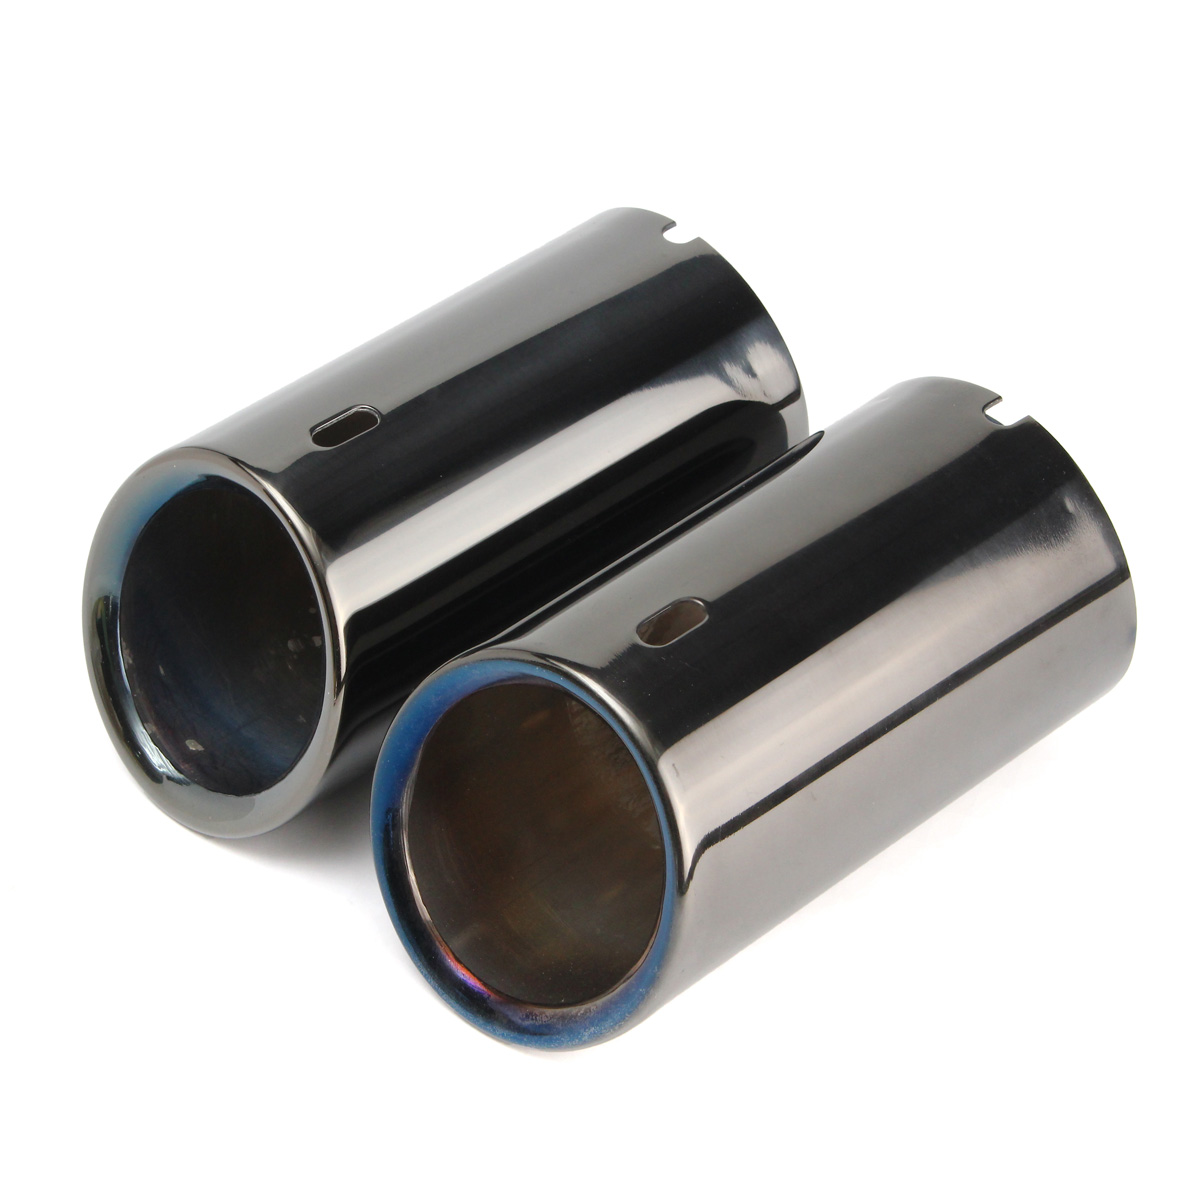 Muffler Exhaust Tail Pipe Tip For 06-10 BMW E90 E92 325 3Series 2XTitanium Black